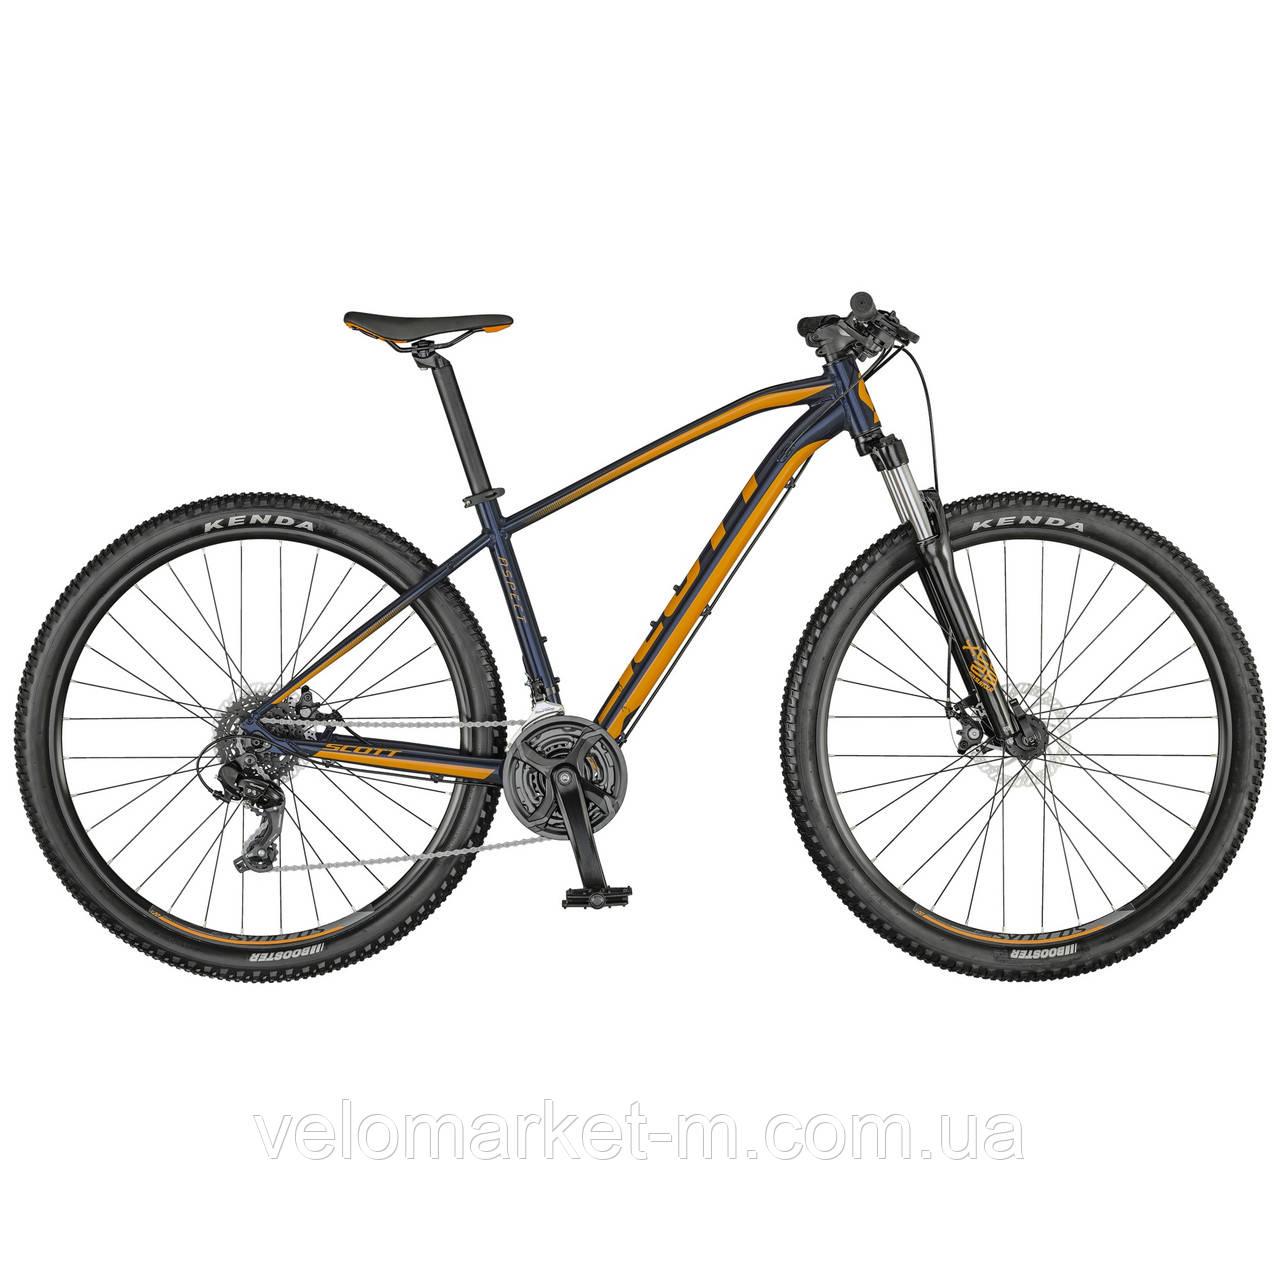 Велосипед Scott Aspect 970 L Stellar blue 2021